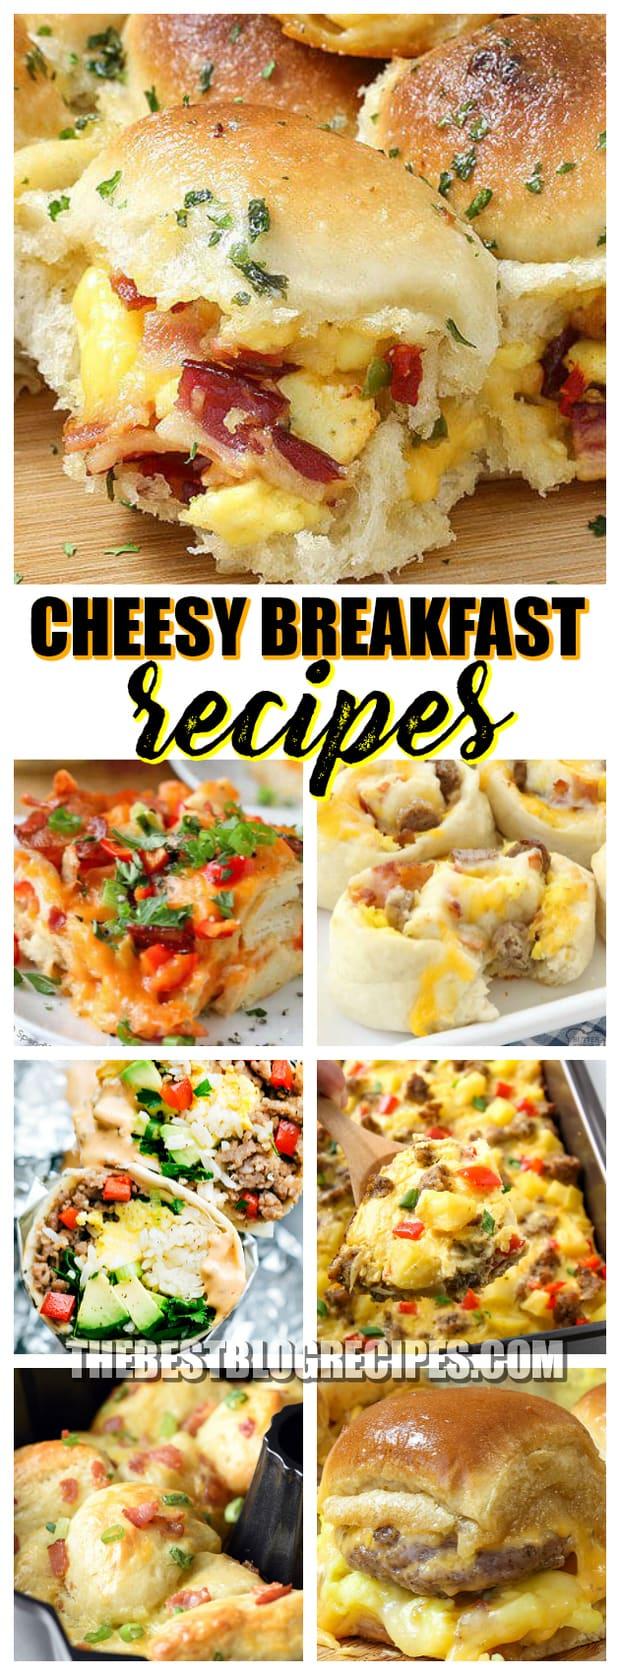 Cheesy Breakfast Recipes PERFECT for Saturday Mornings